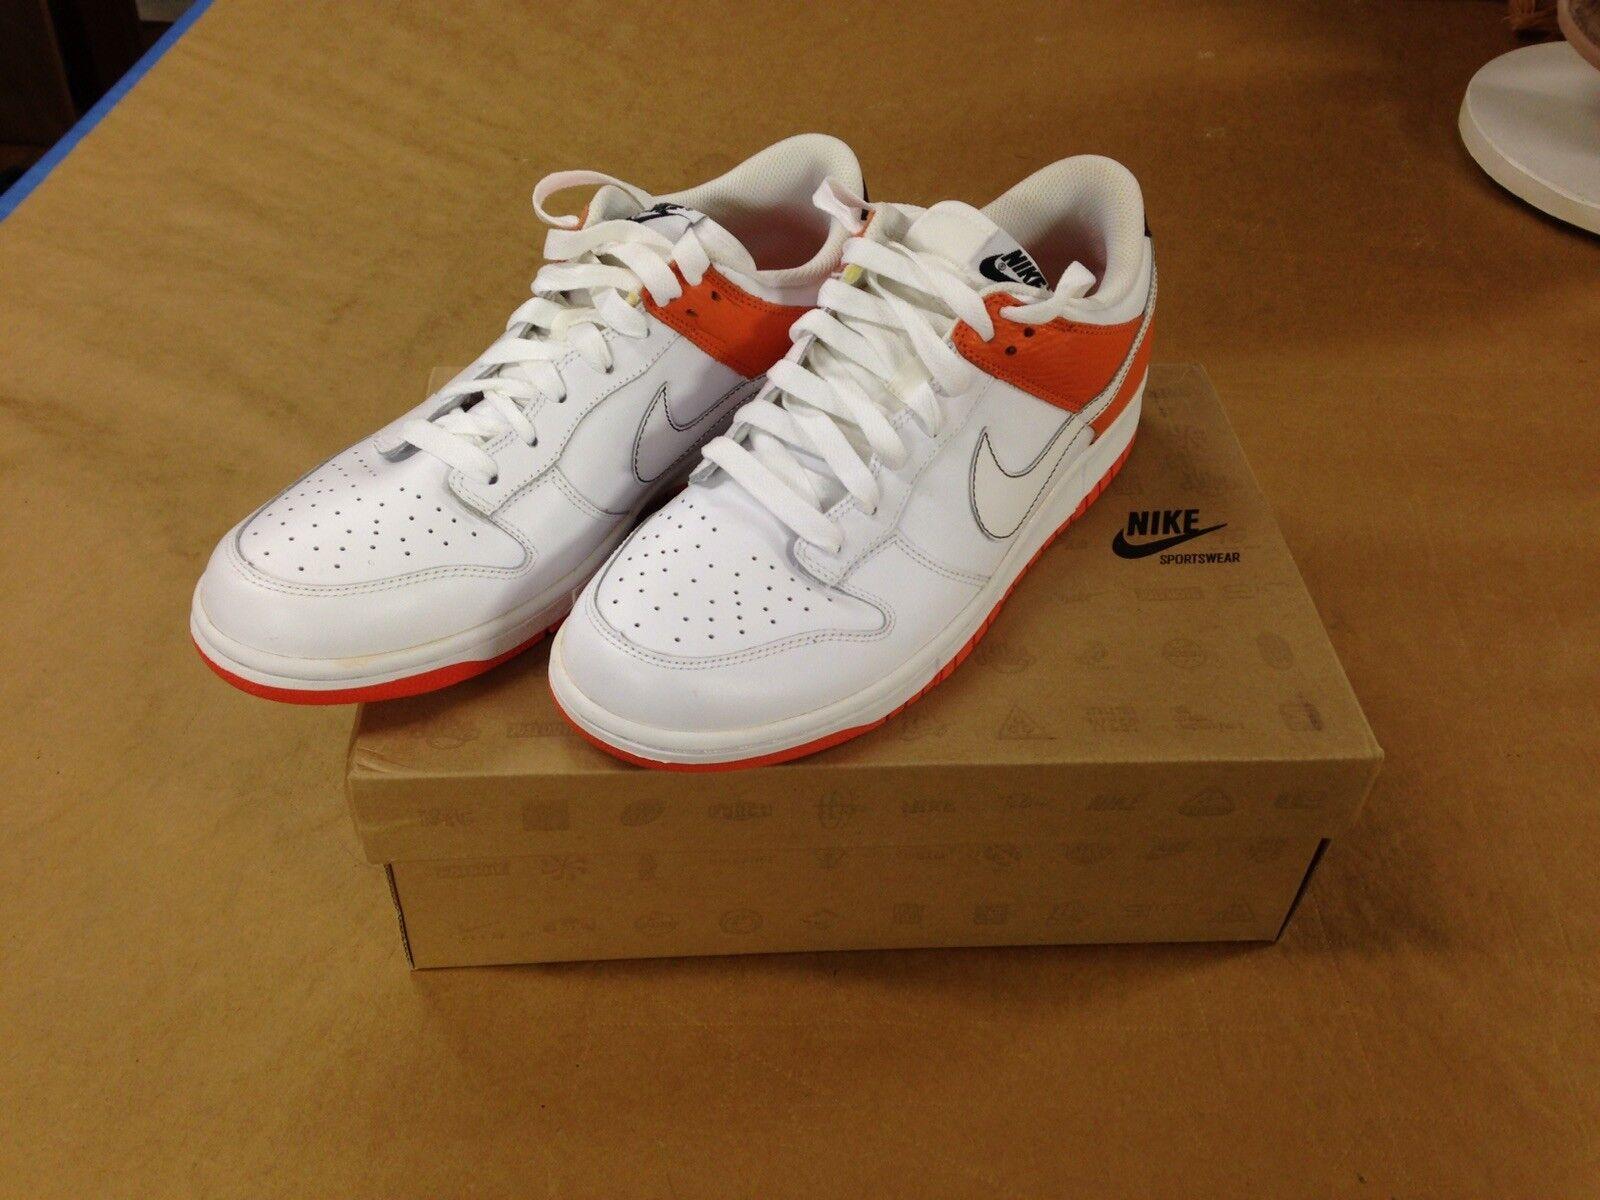 Nike Dunk Low White orange Blaze (311730 311) Men's HTF Size 11.5 Never Worn Box